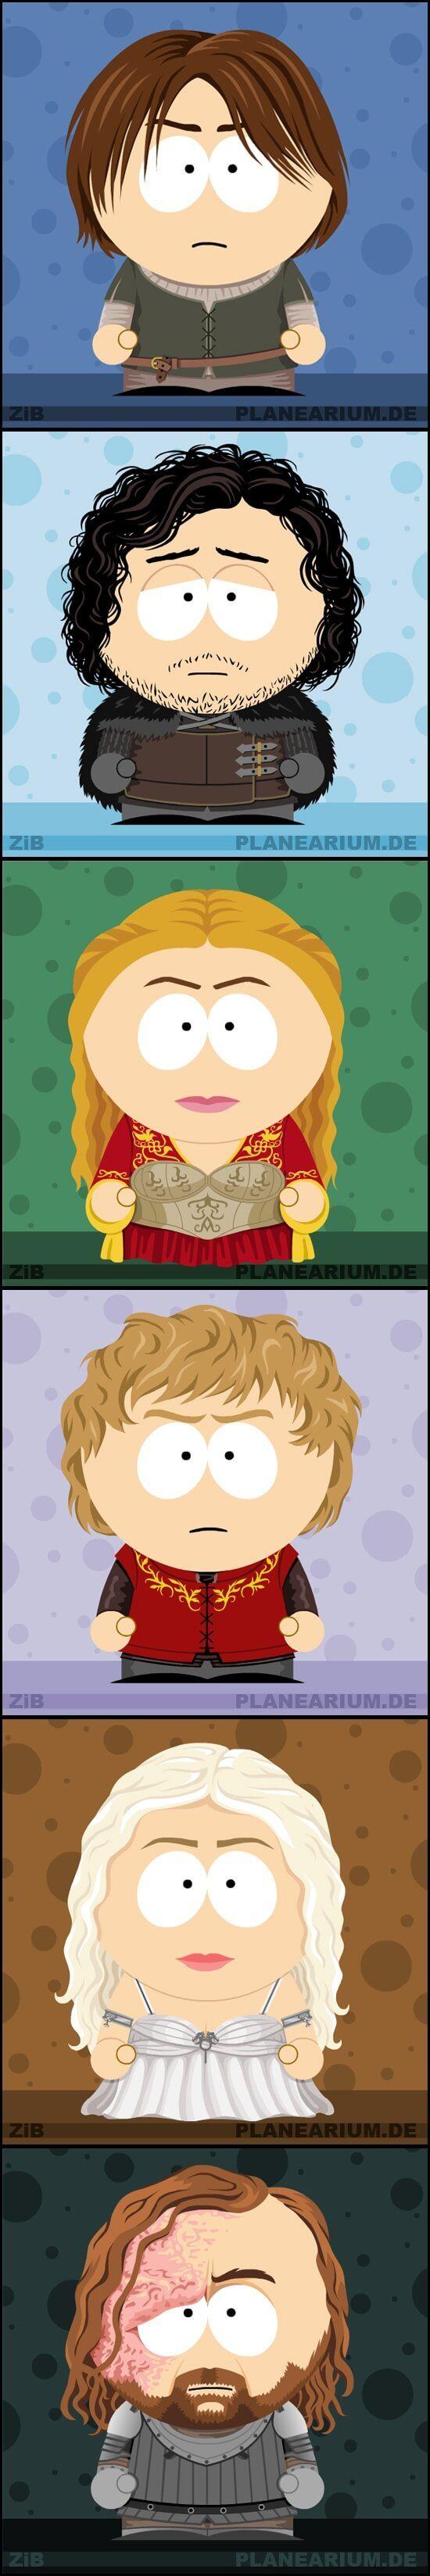 Arya Stark, Jon Snow, Cersei Lannister, Tyrion Lannister, Daenerys Targaryen and Sandor Clegane, aka The Hound, as South Park characters